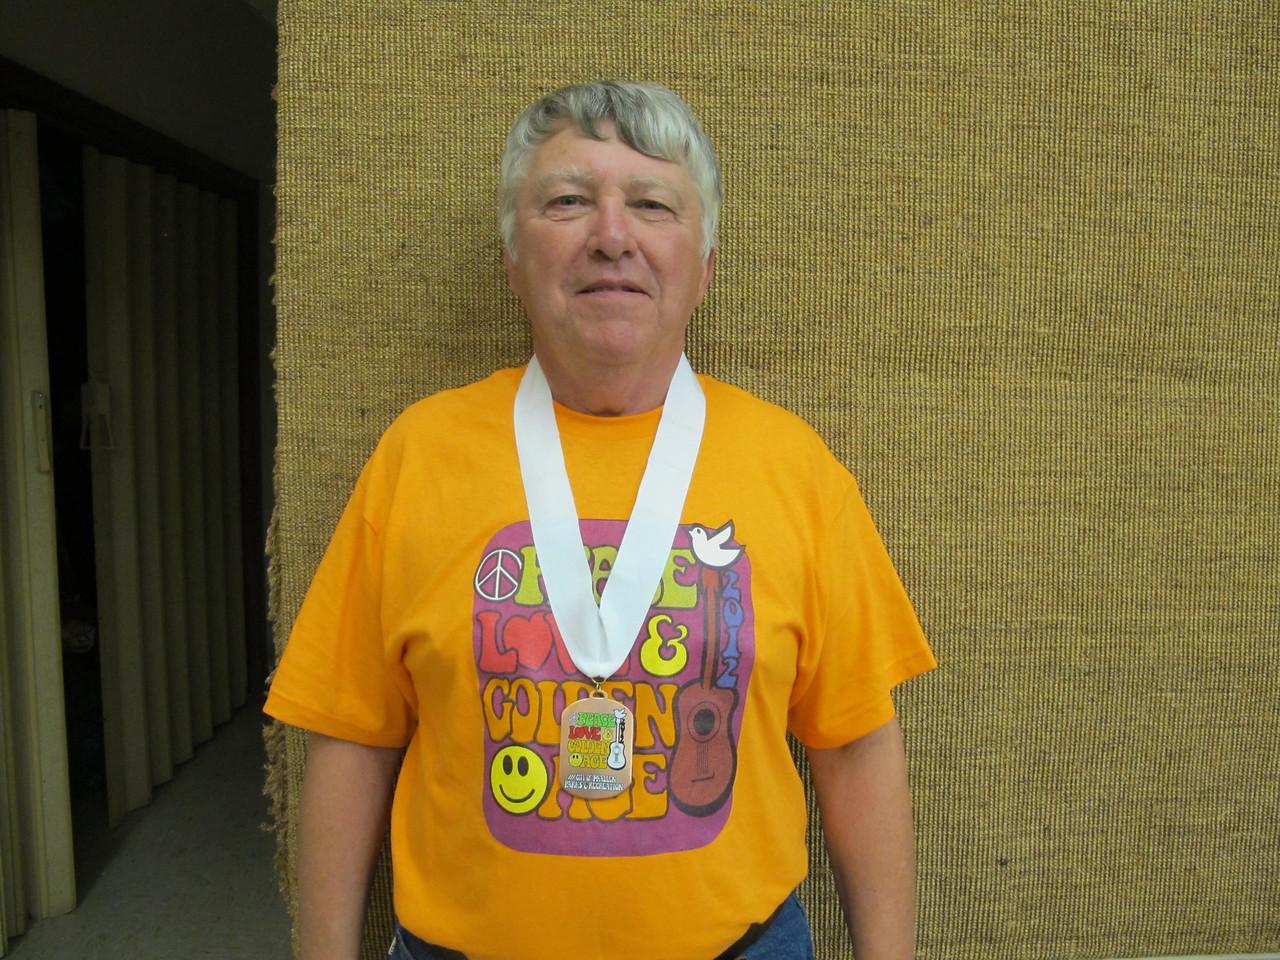 Men's Cribbage 3rd Place - Jack Halpin (Bentsen State Park)